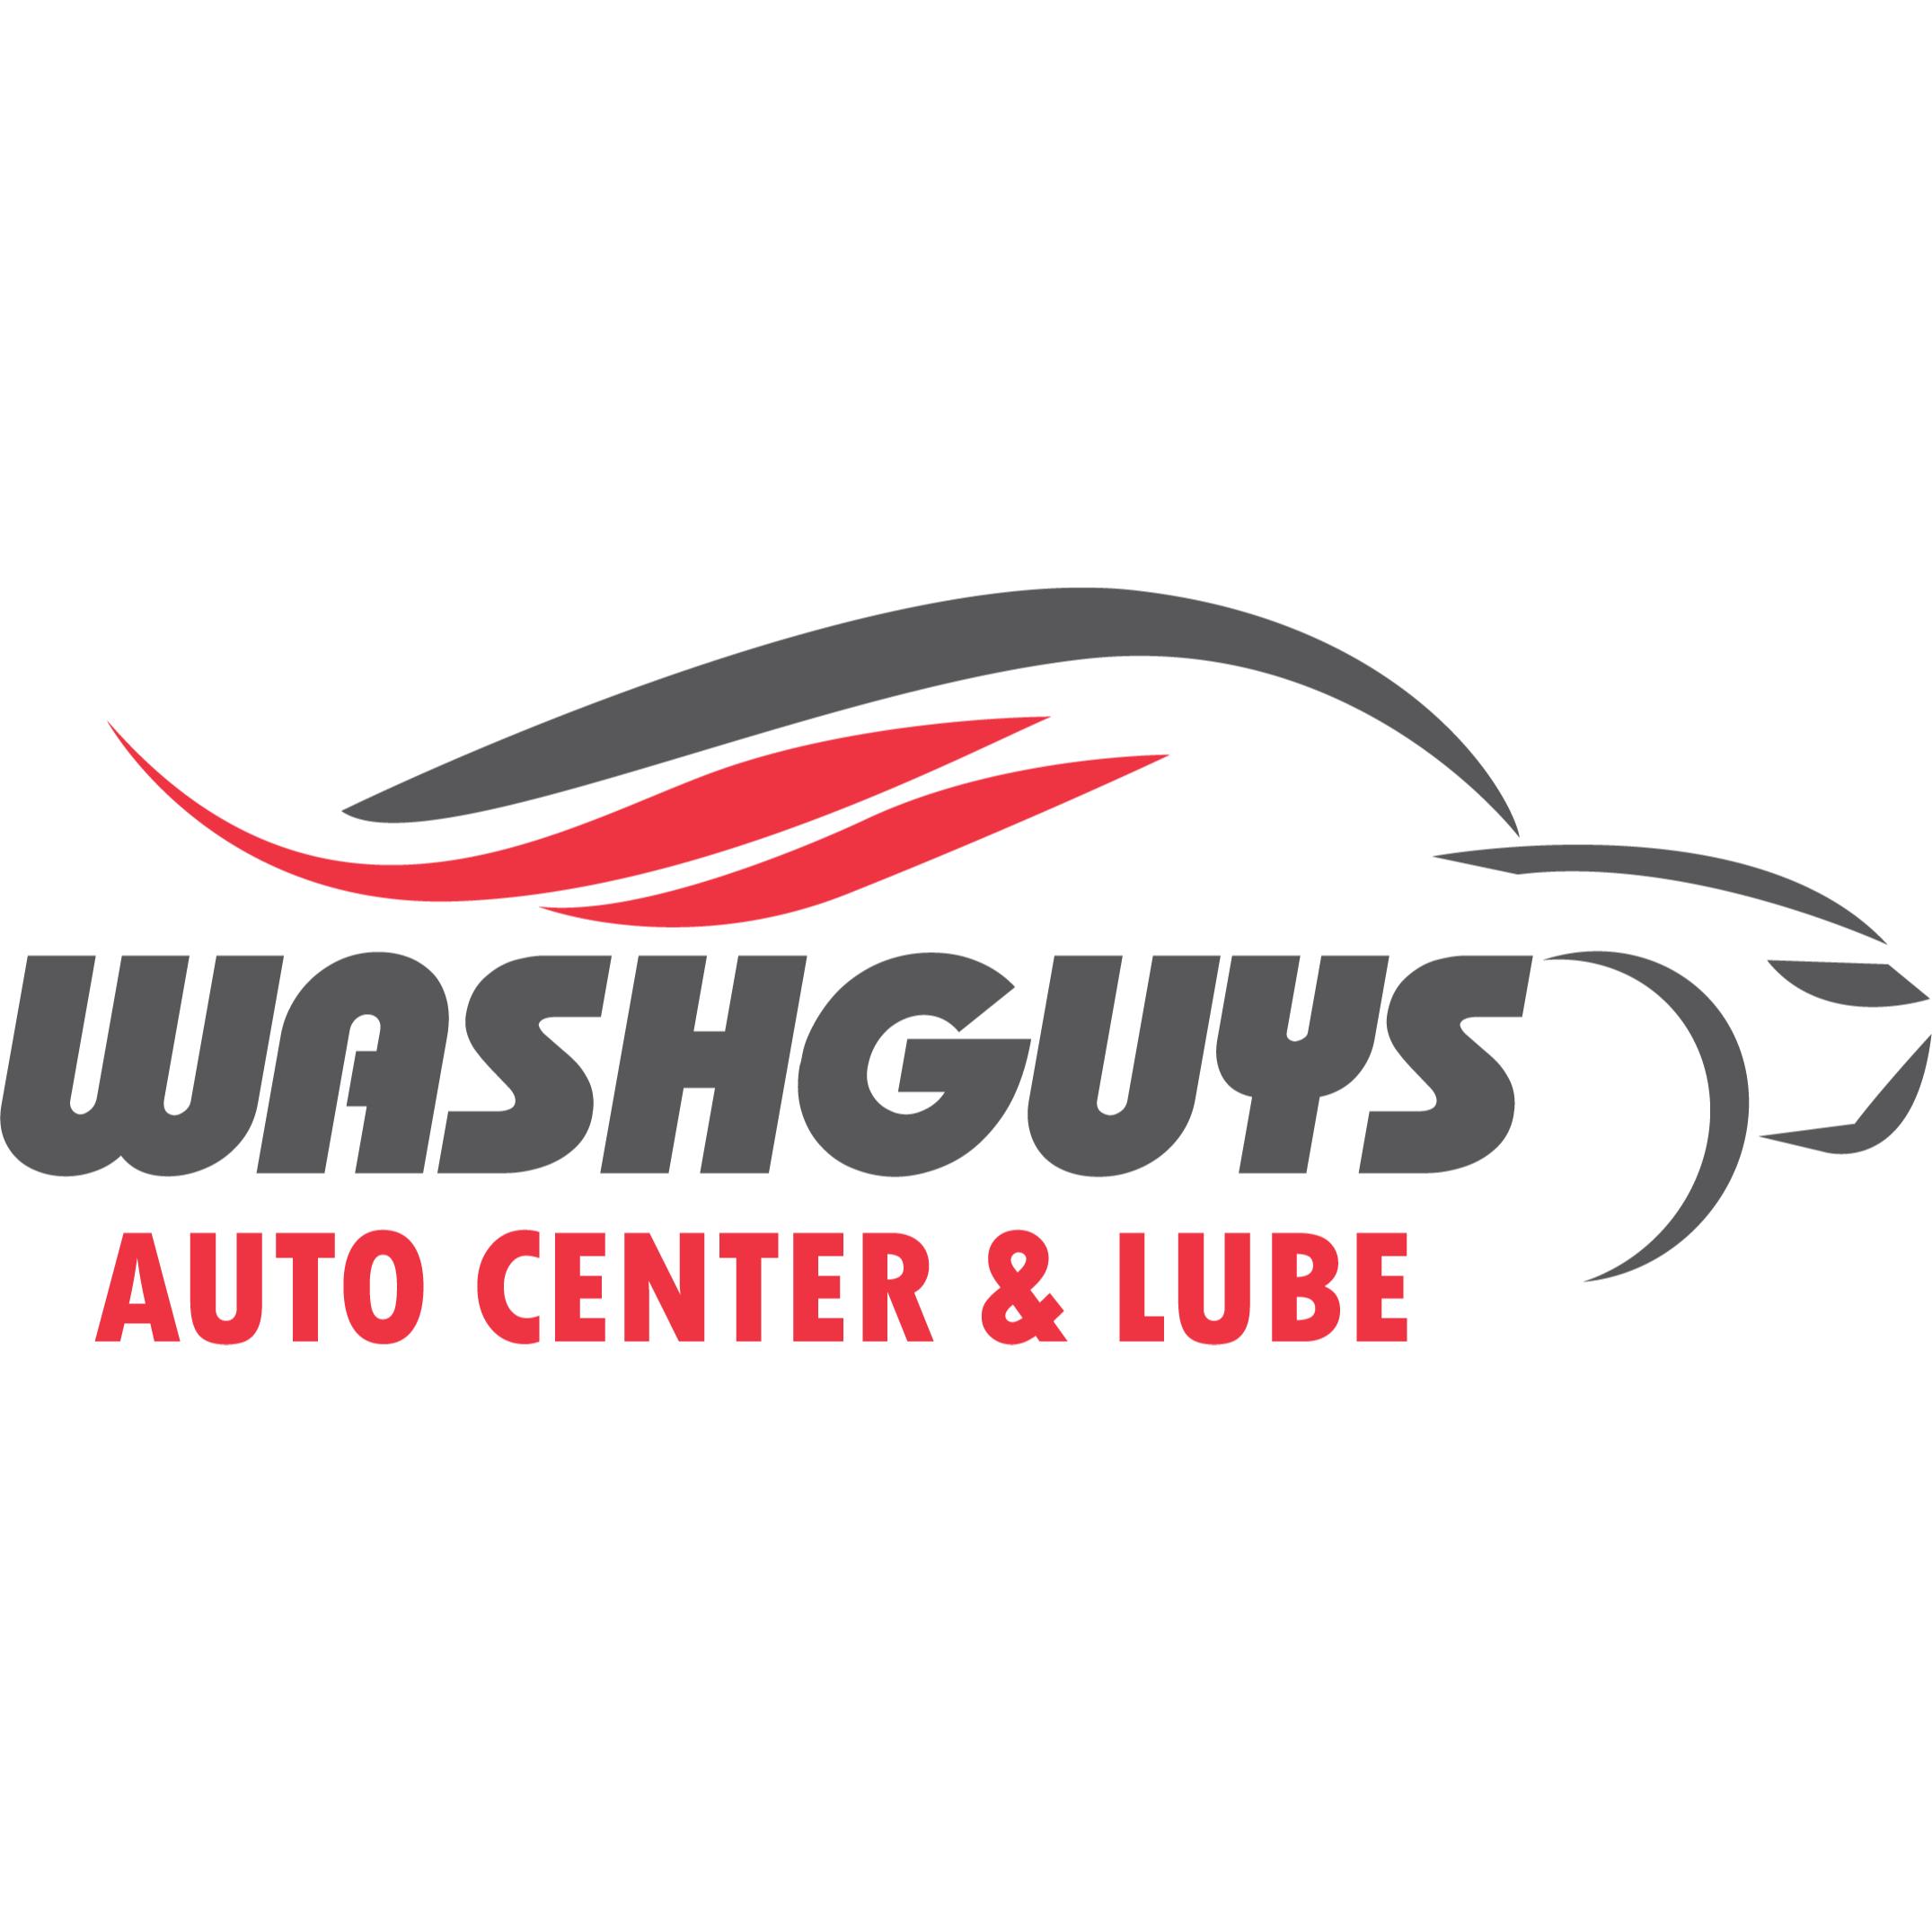 Washguys Automotive and Lube